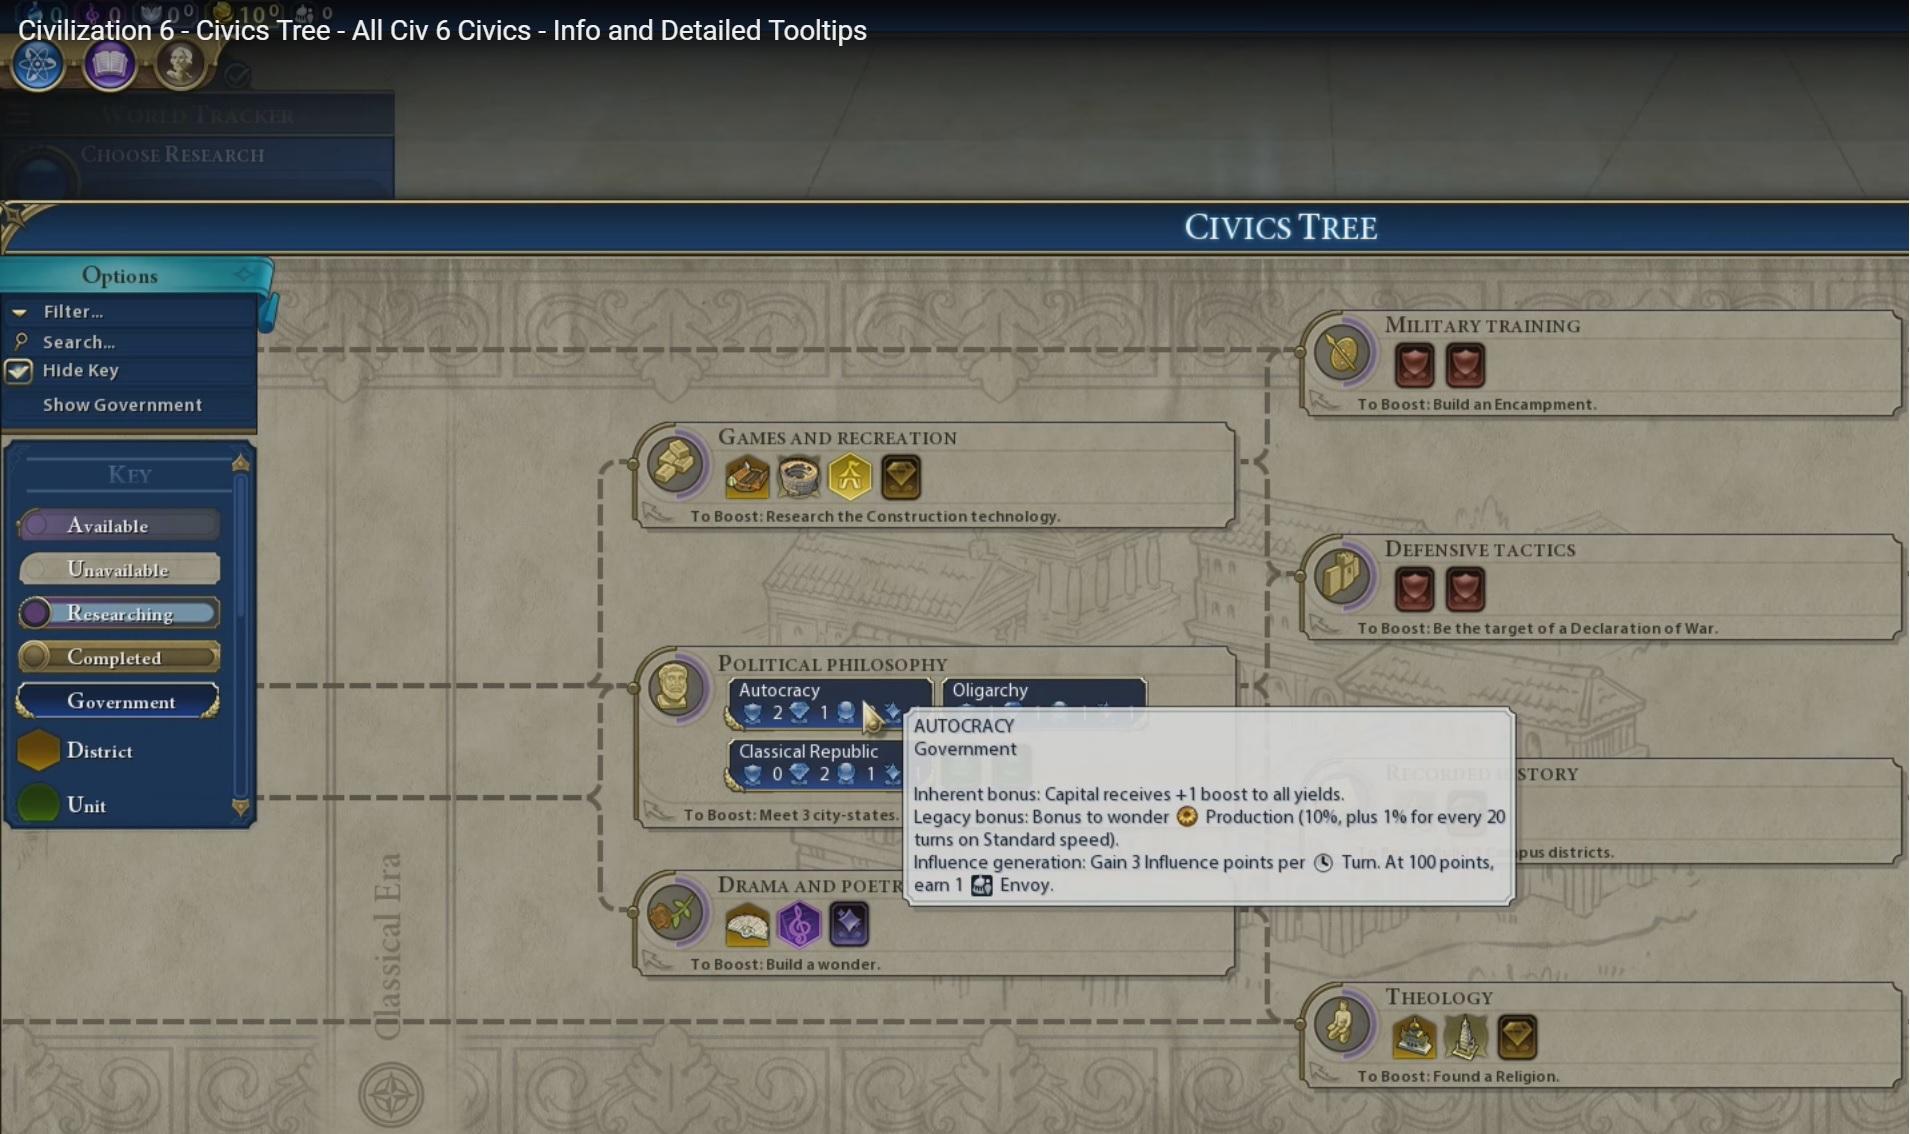 Civ 6 legacy bonus